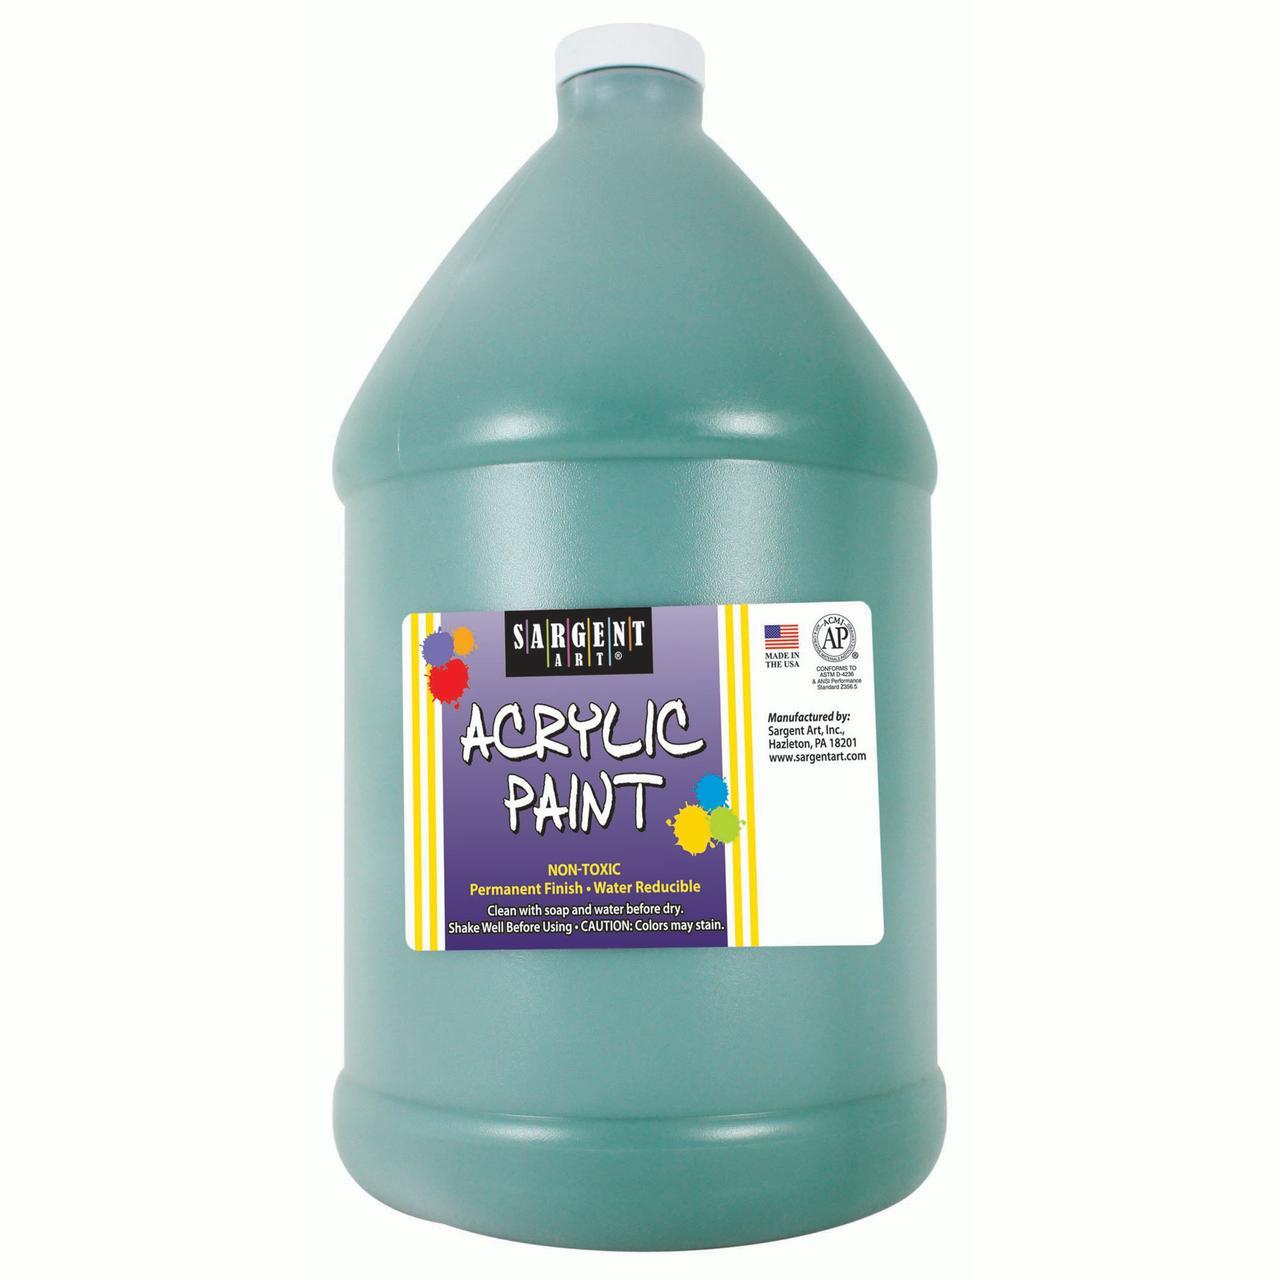 Sargent Art® Acrylic Paint, Green, 64 oz. Bottle (Half Gallon)